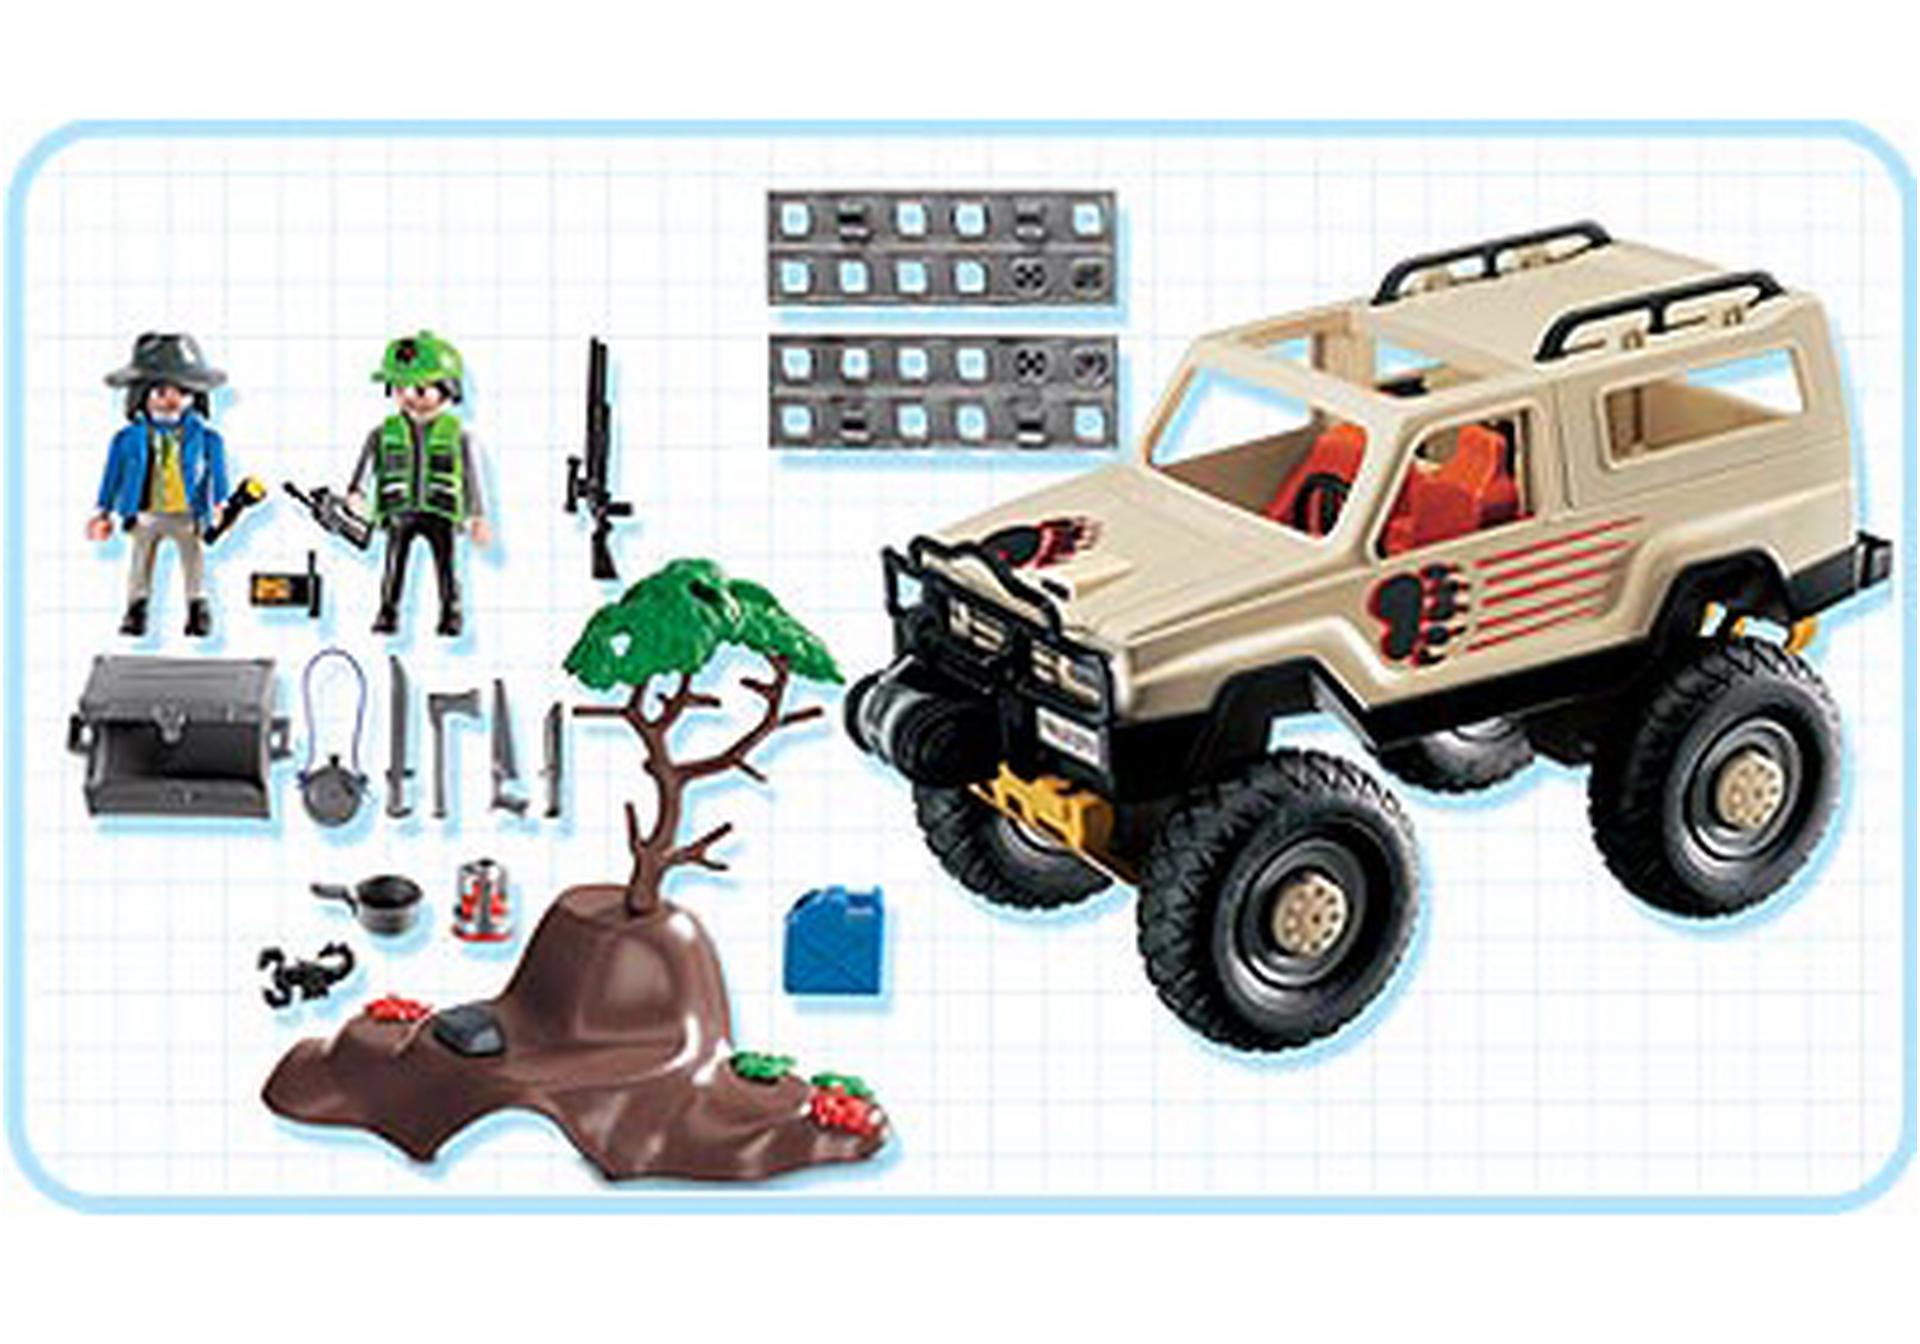 Offroad pickup 3219 c playmobil deutschland for Jugendzimmer playmobil